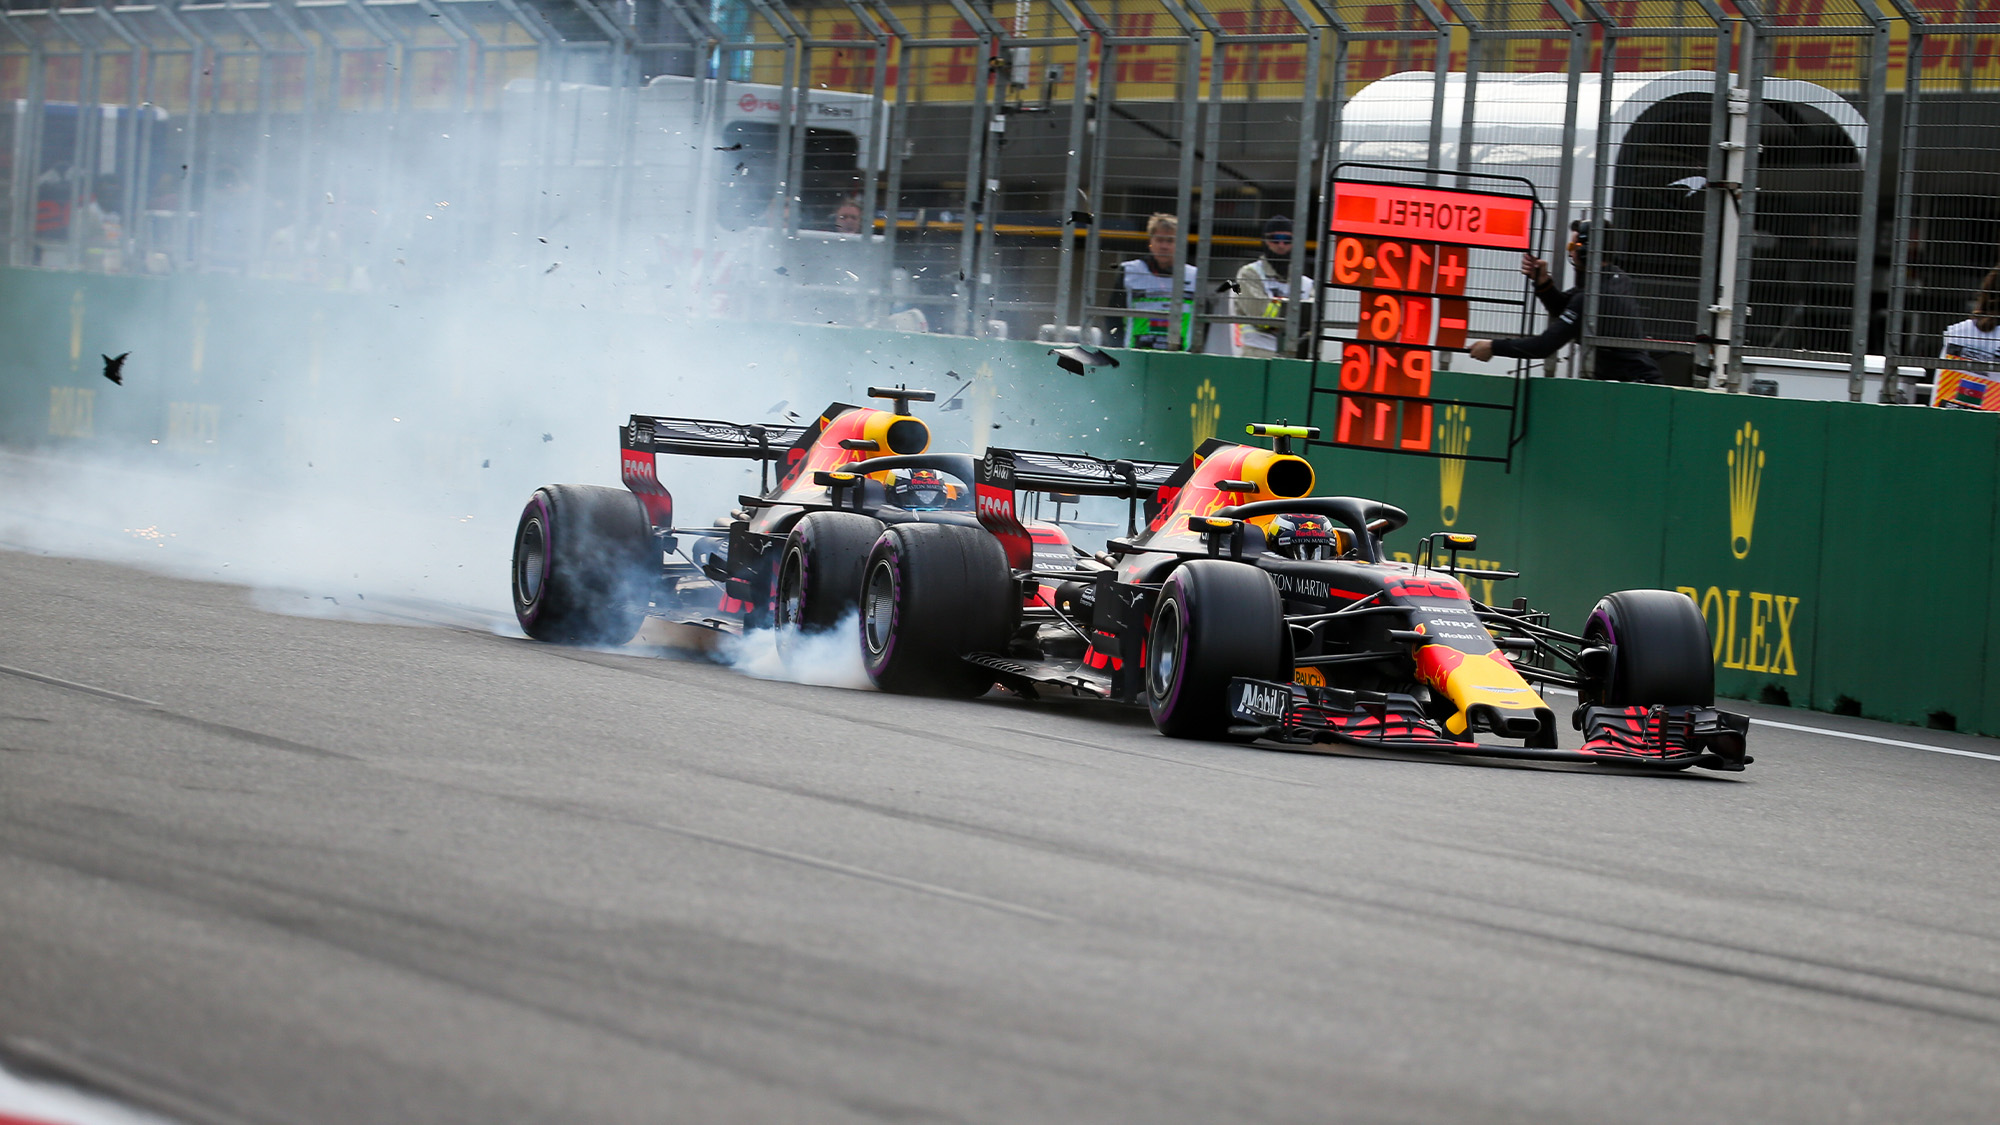 Daniel Ricciardo and Max Verstappen collide in Baku at rhe 2018 Azerbaijan Grand Prix